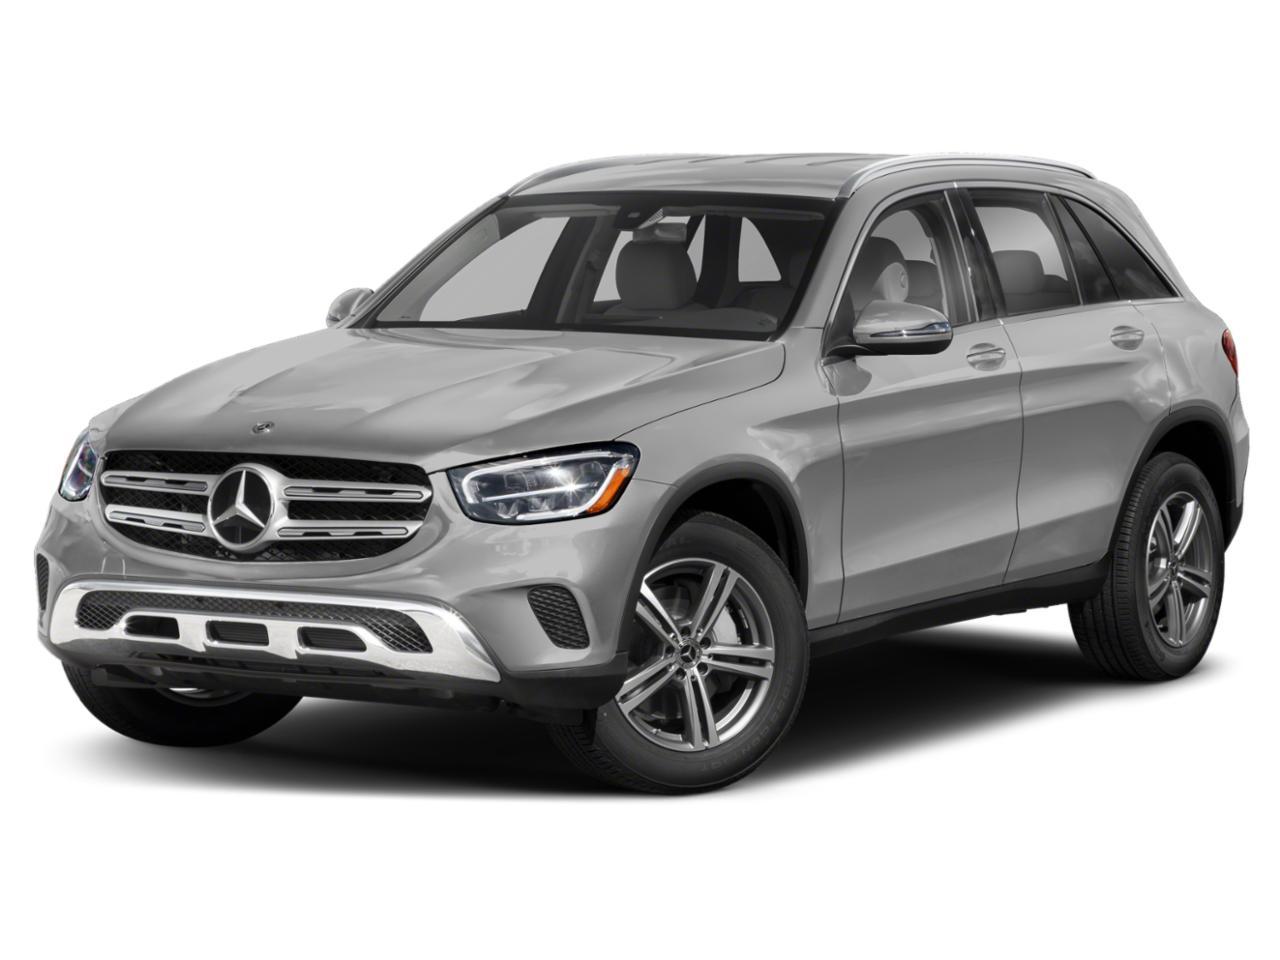 2021 Mercedes-Benz GLC Vehicle Photo in Appleton, WI 54913